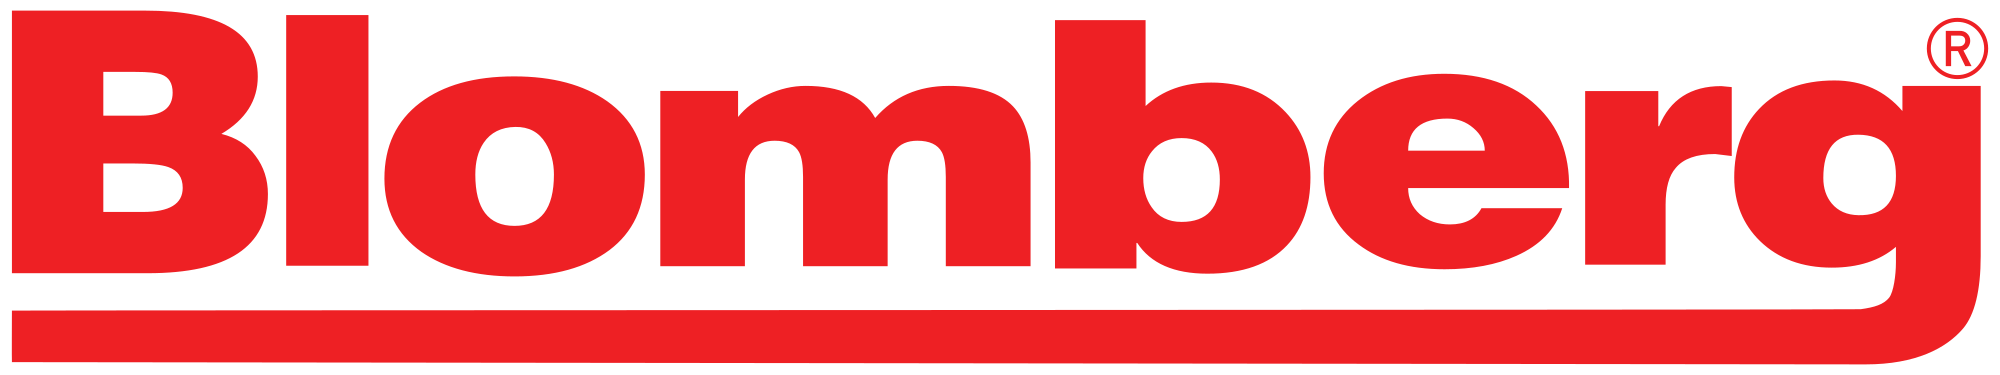 2000px-Blomberg_-Hausger-te-_logo-svg